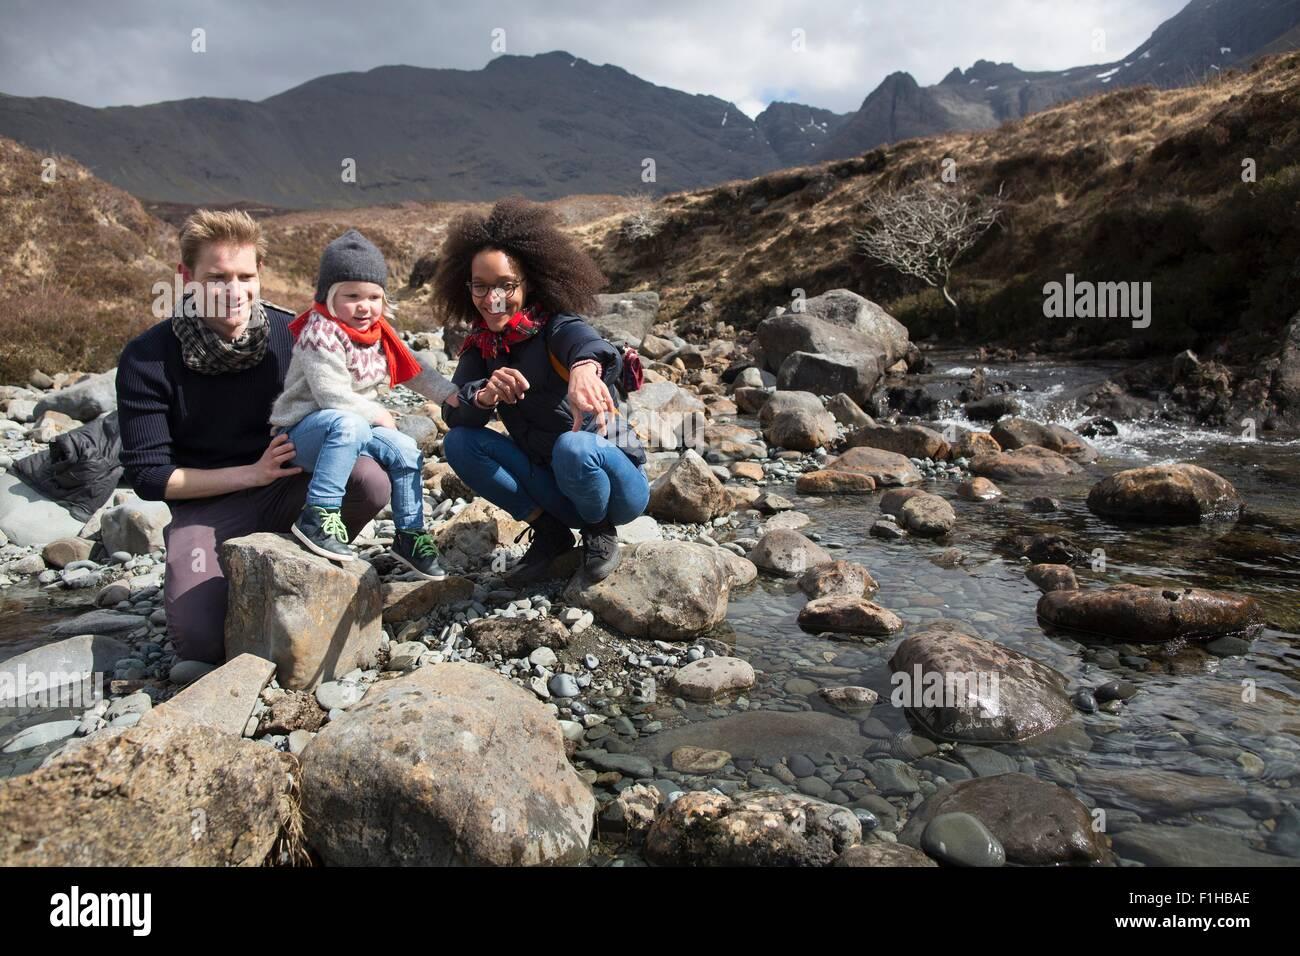 Family by stream, Fairy Pools, Isle of Skye, Hebrides, Scotland - Stock Image